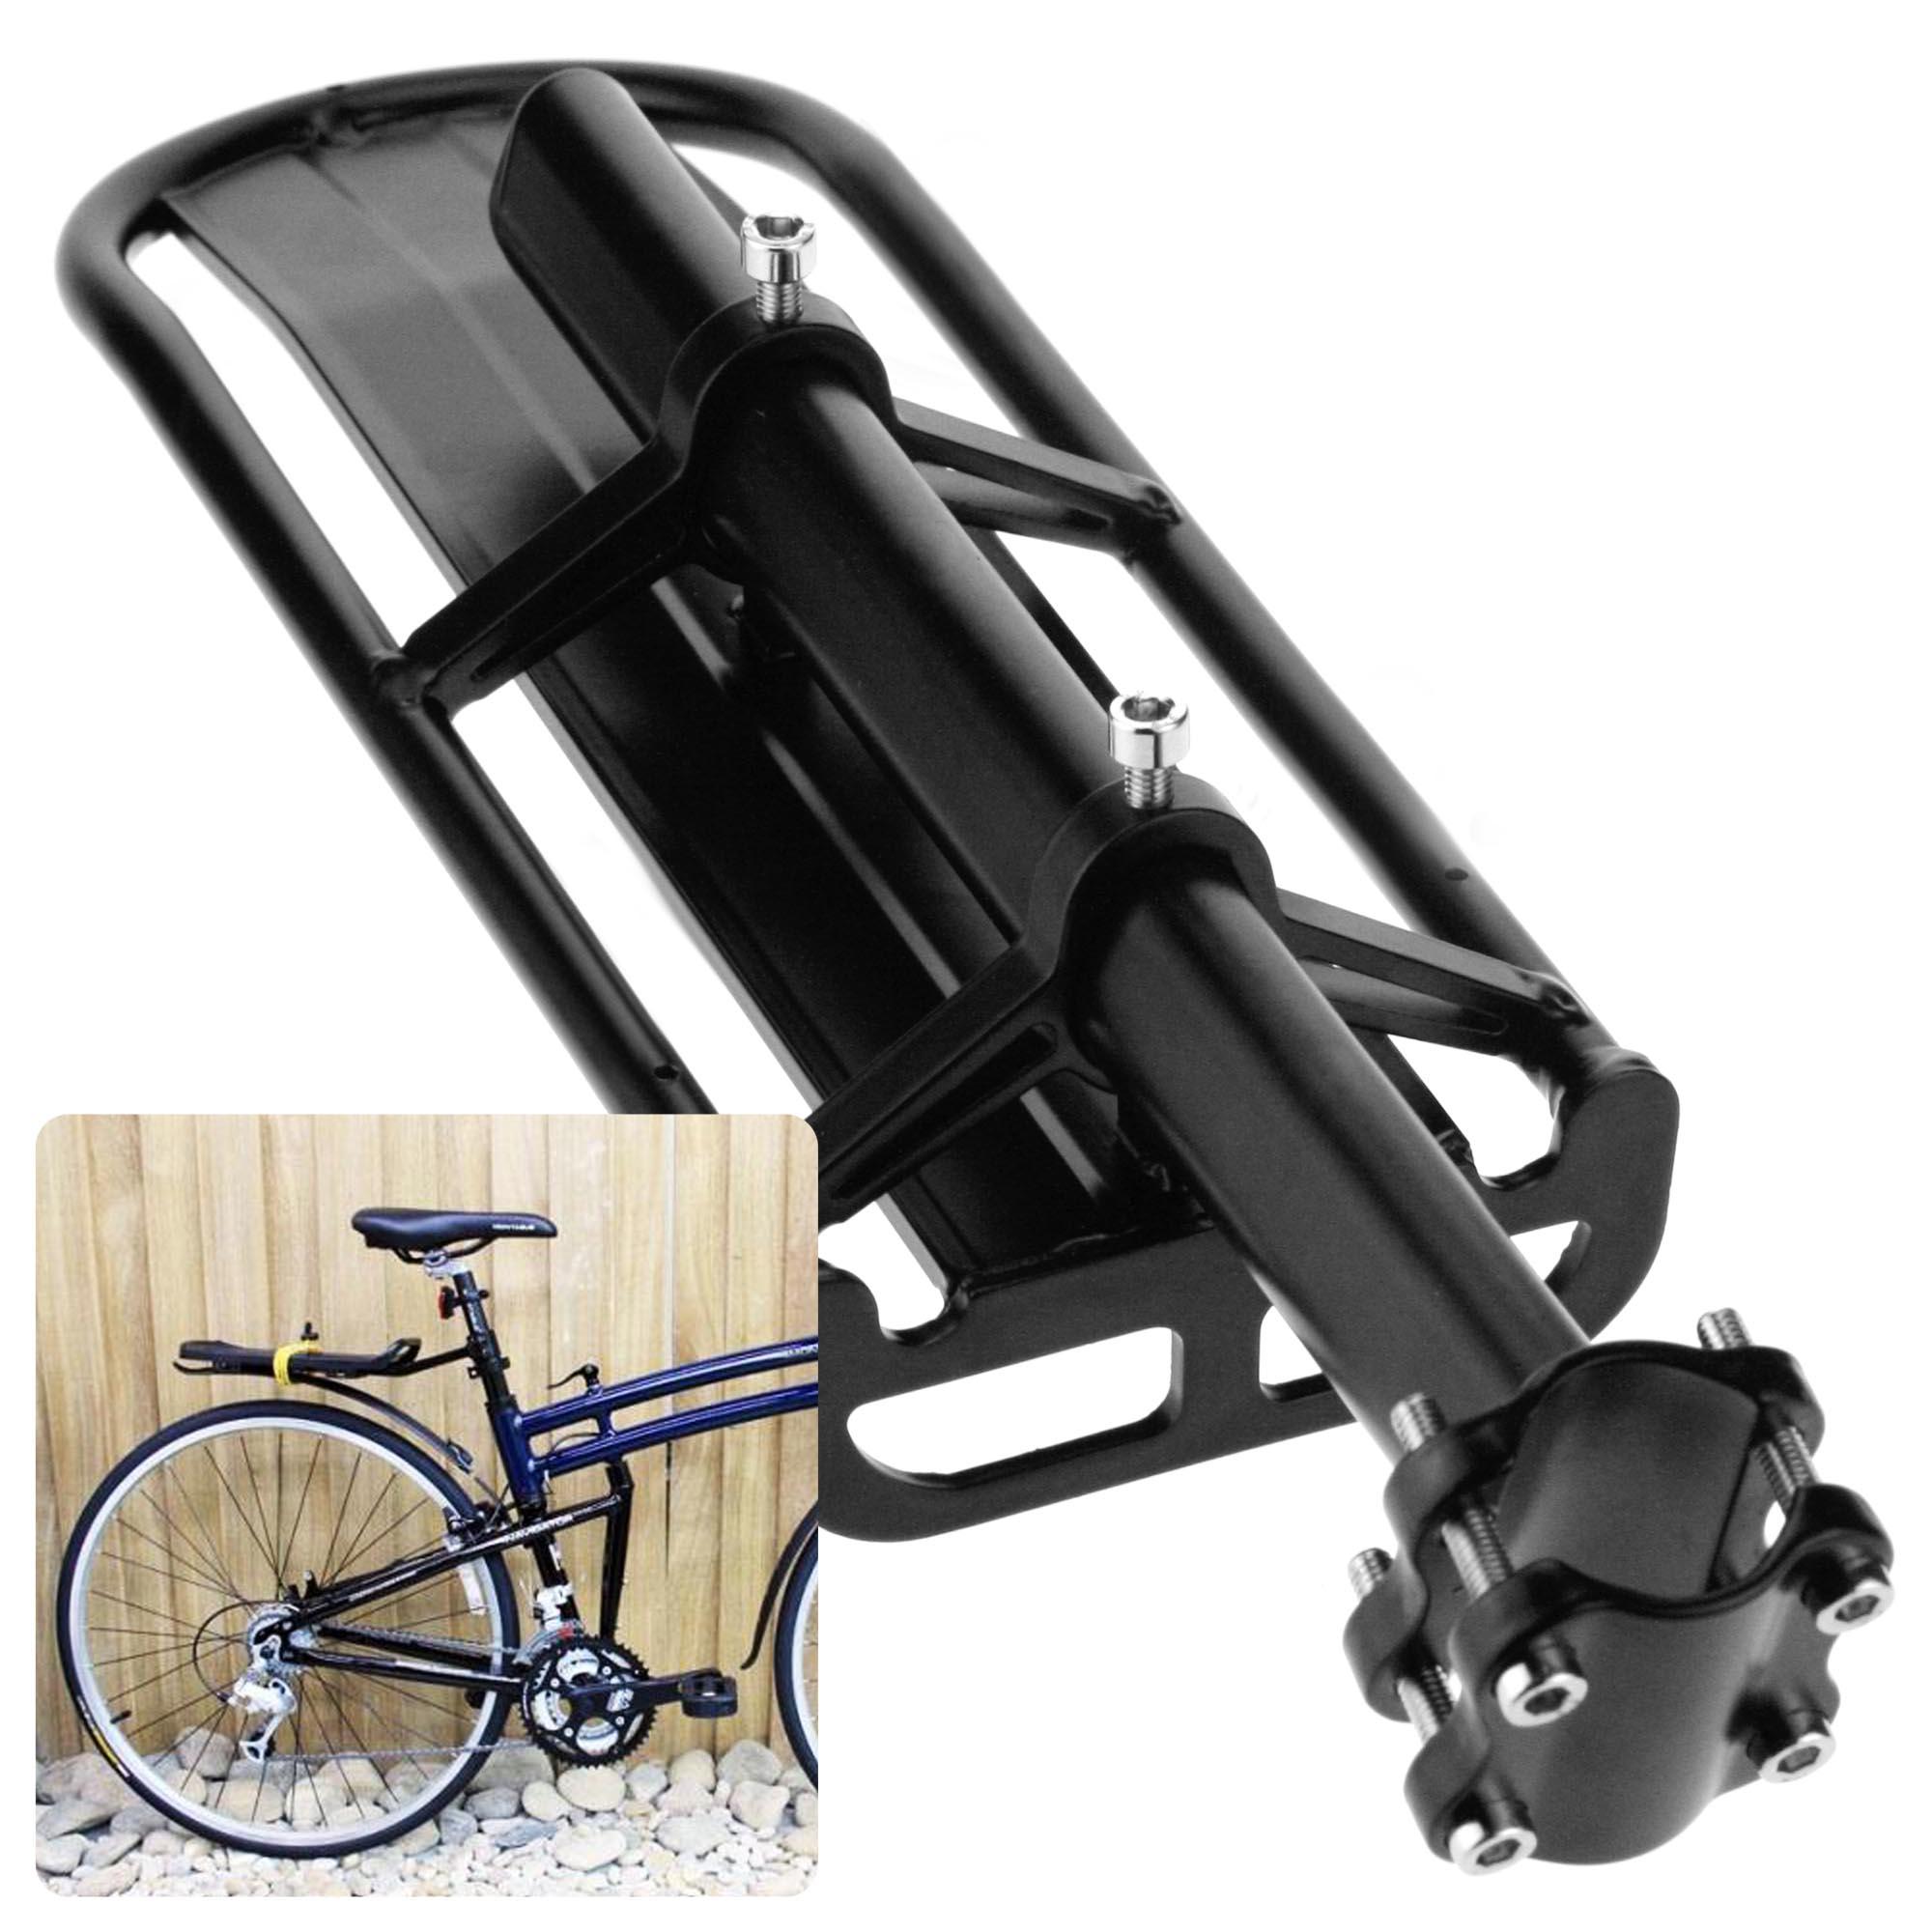 Extendable Bike Rack : Bicycle bike cycle mount aluminum seat post rear